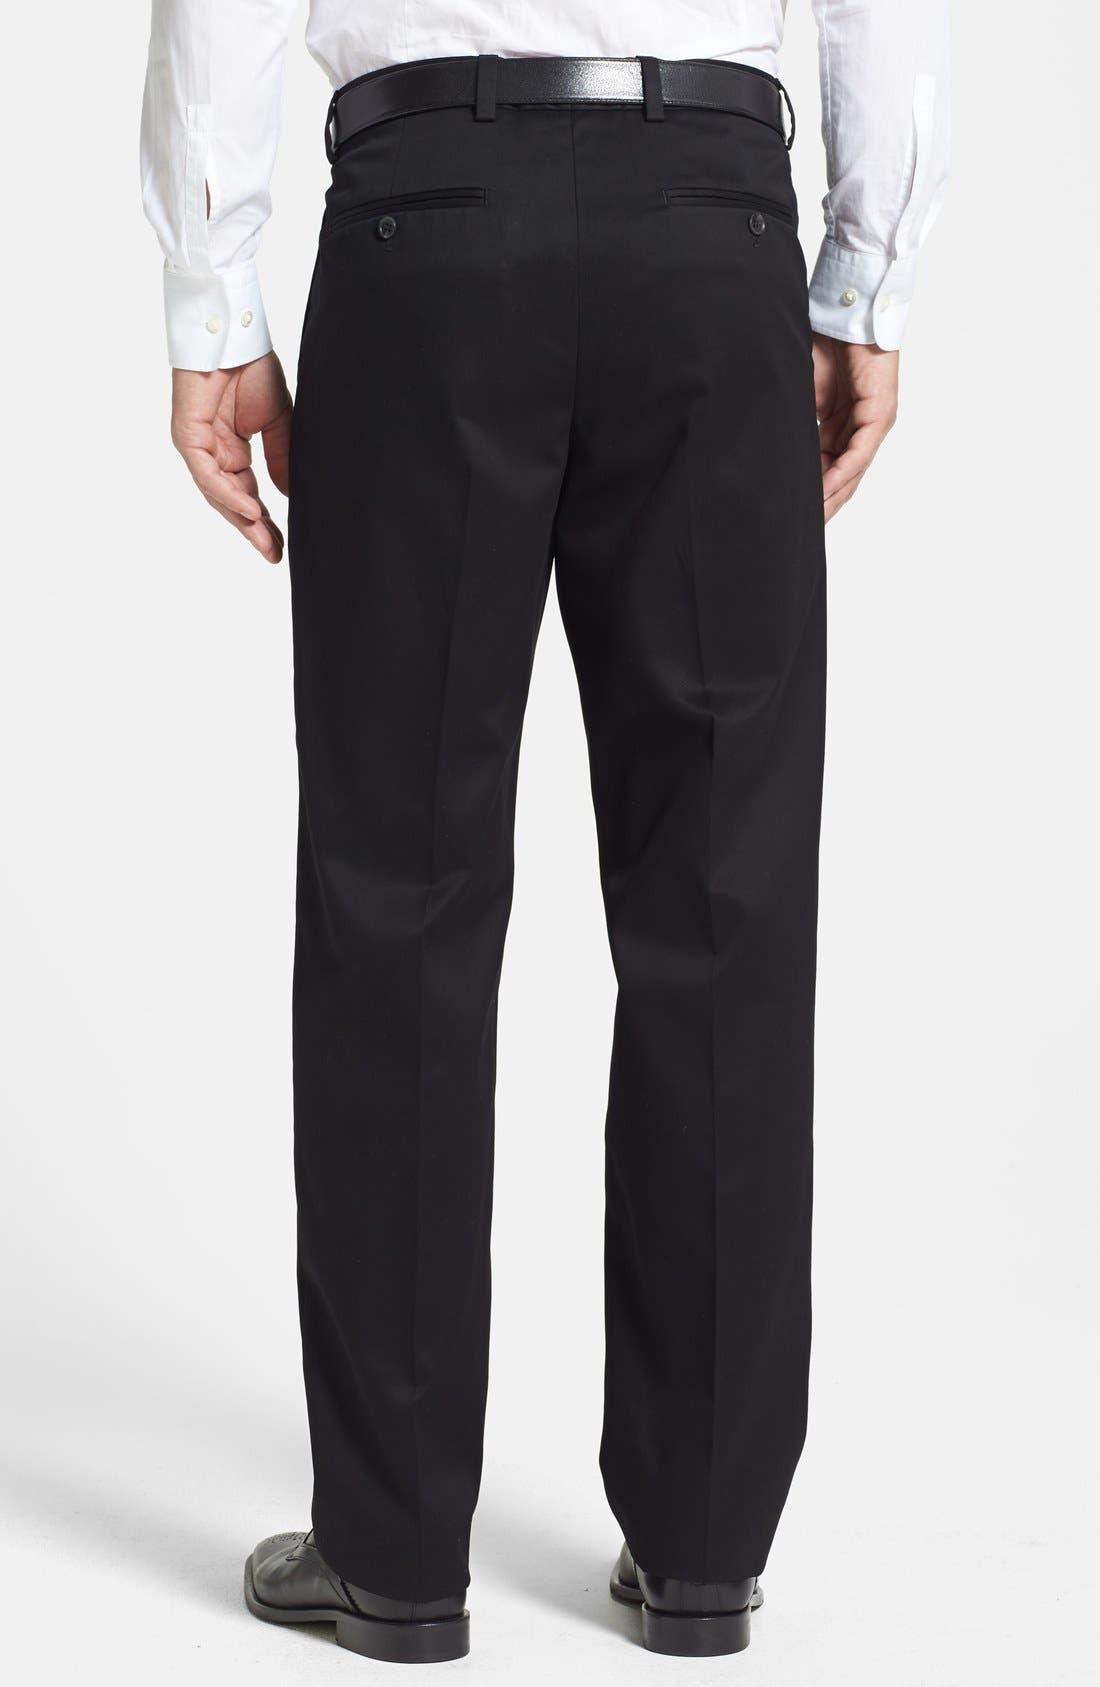 NORDSTROM MEN'S SHOP, 'Classic' Smartcare<sup>™</sup> Relaxed Fit Double Pleated Cotton Pants, Alternate thumbnail 9, color, BLACK